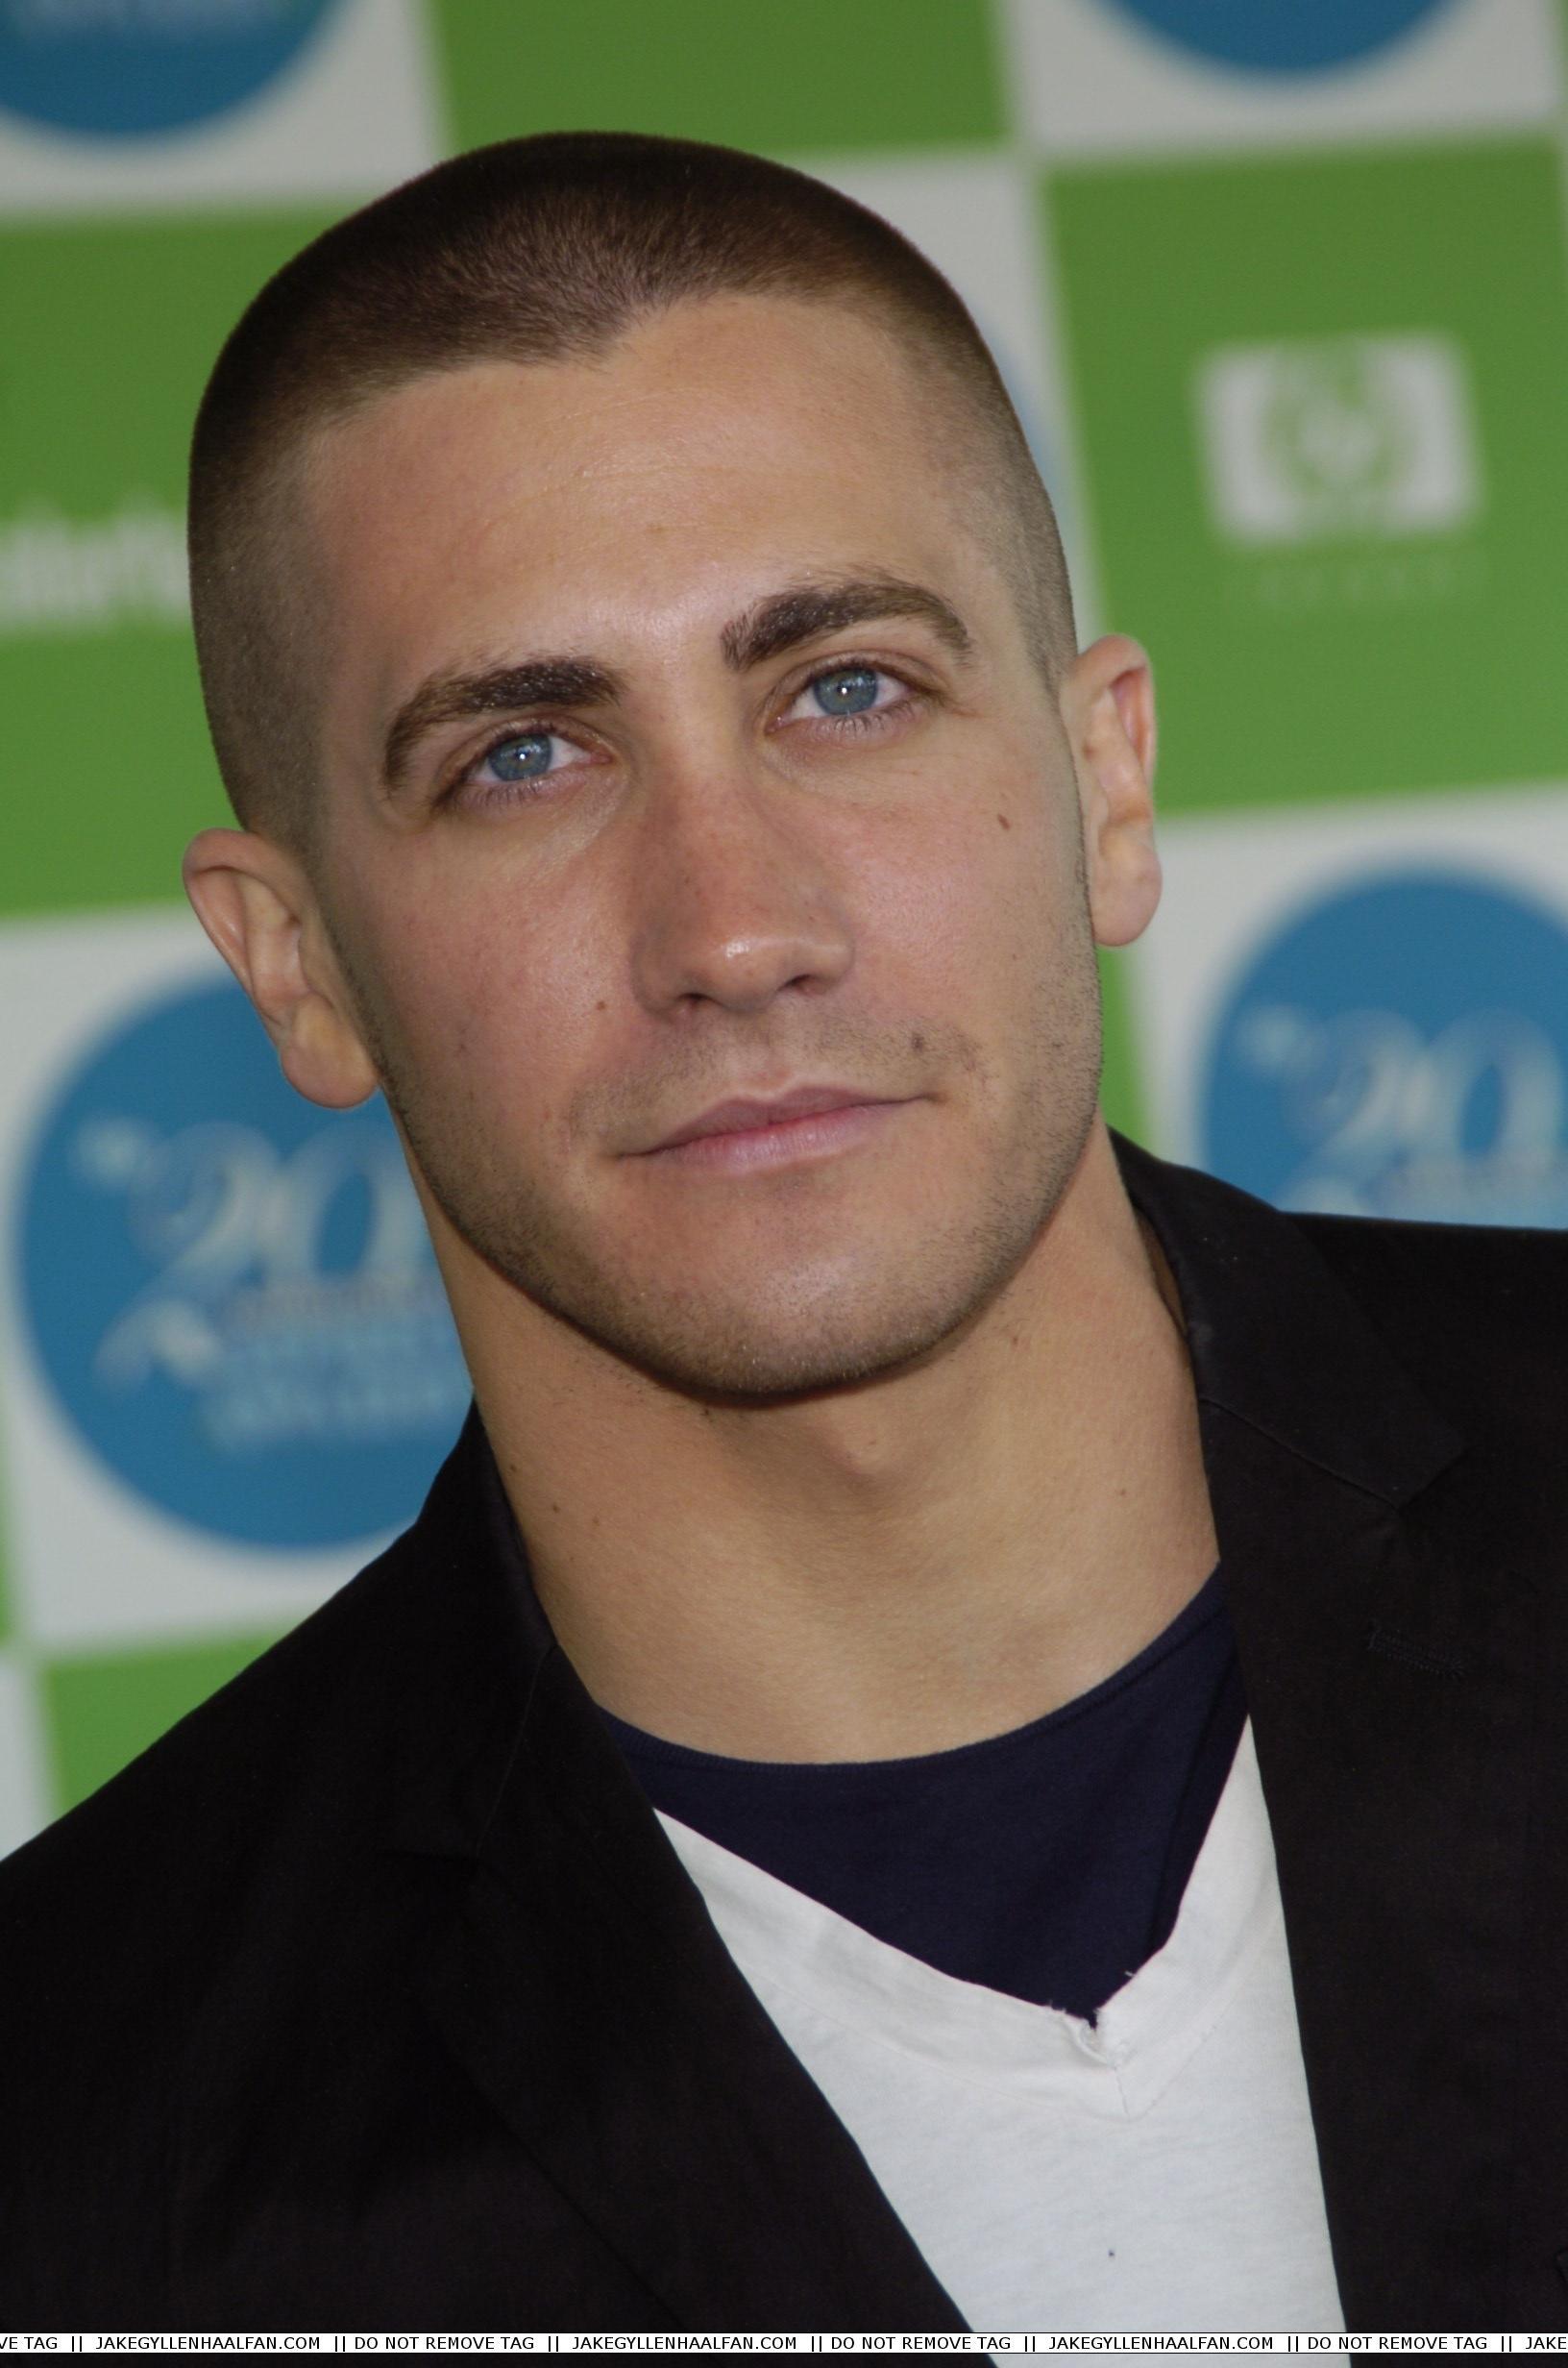 Jake Gyllenhaal photo 132 of 655 pics, wallpaper - photo ... Jake Gyllenhaal